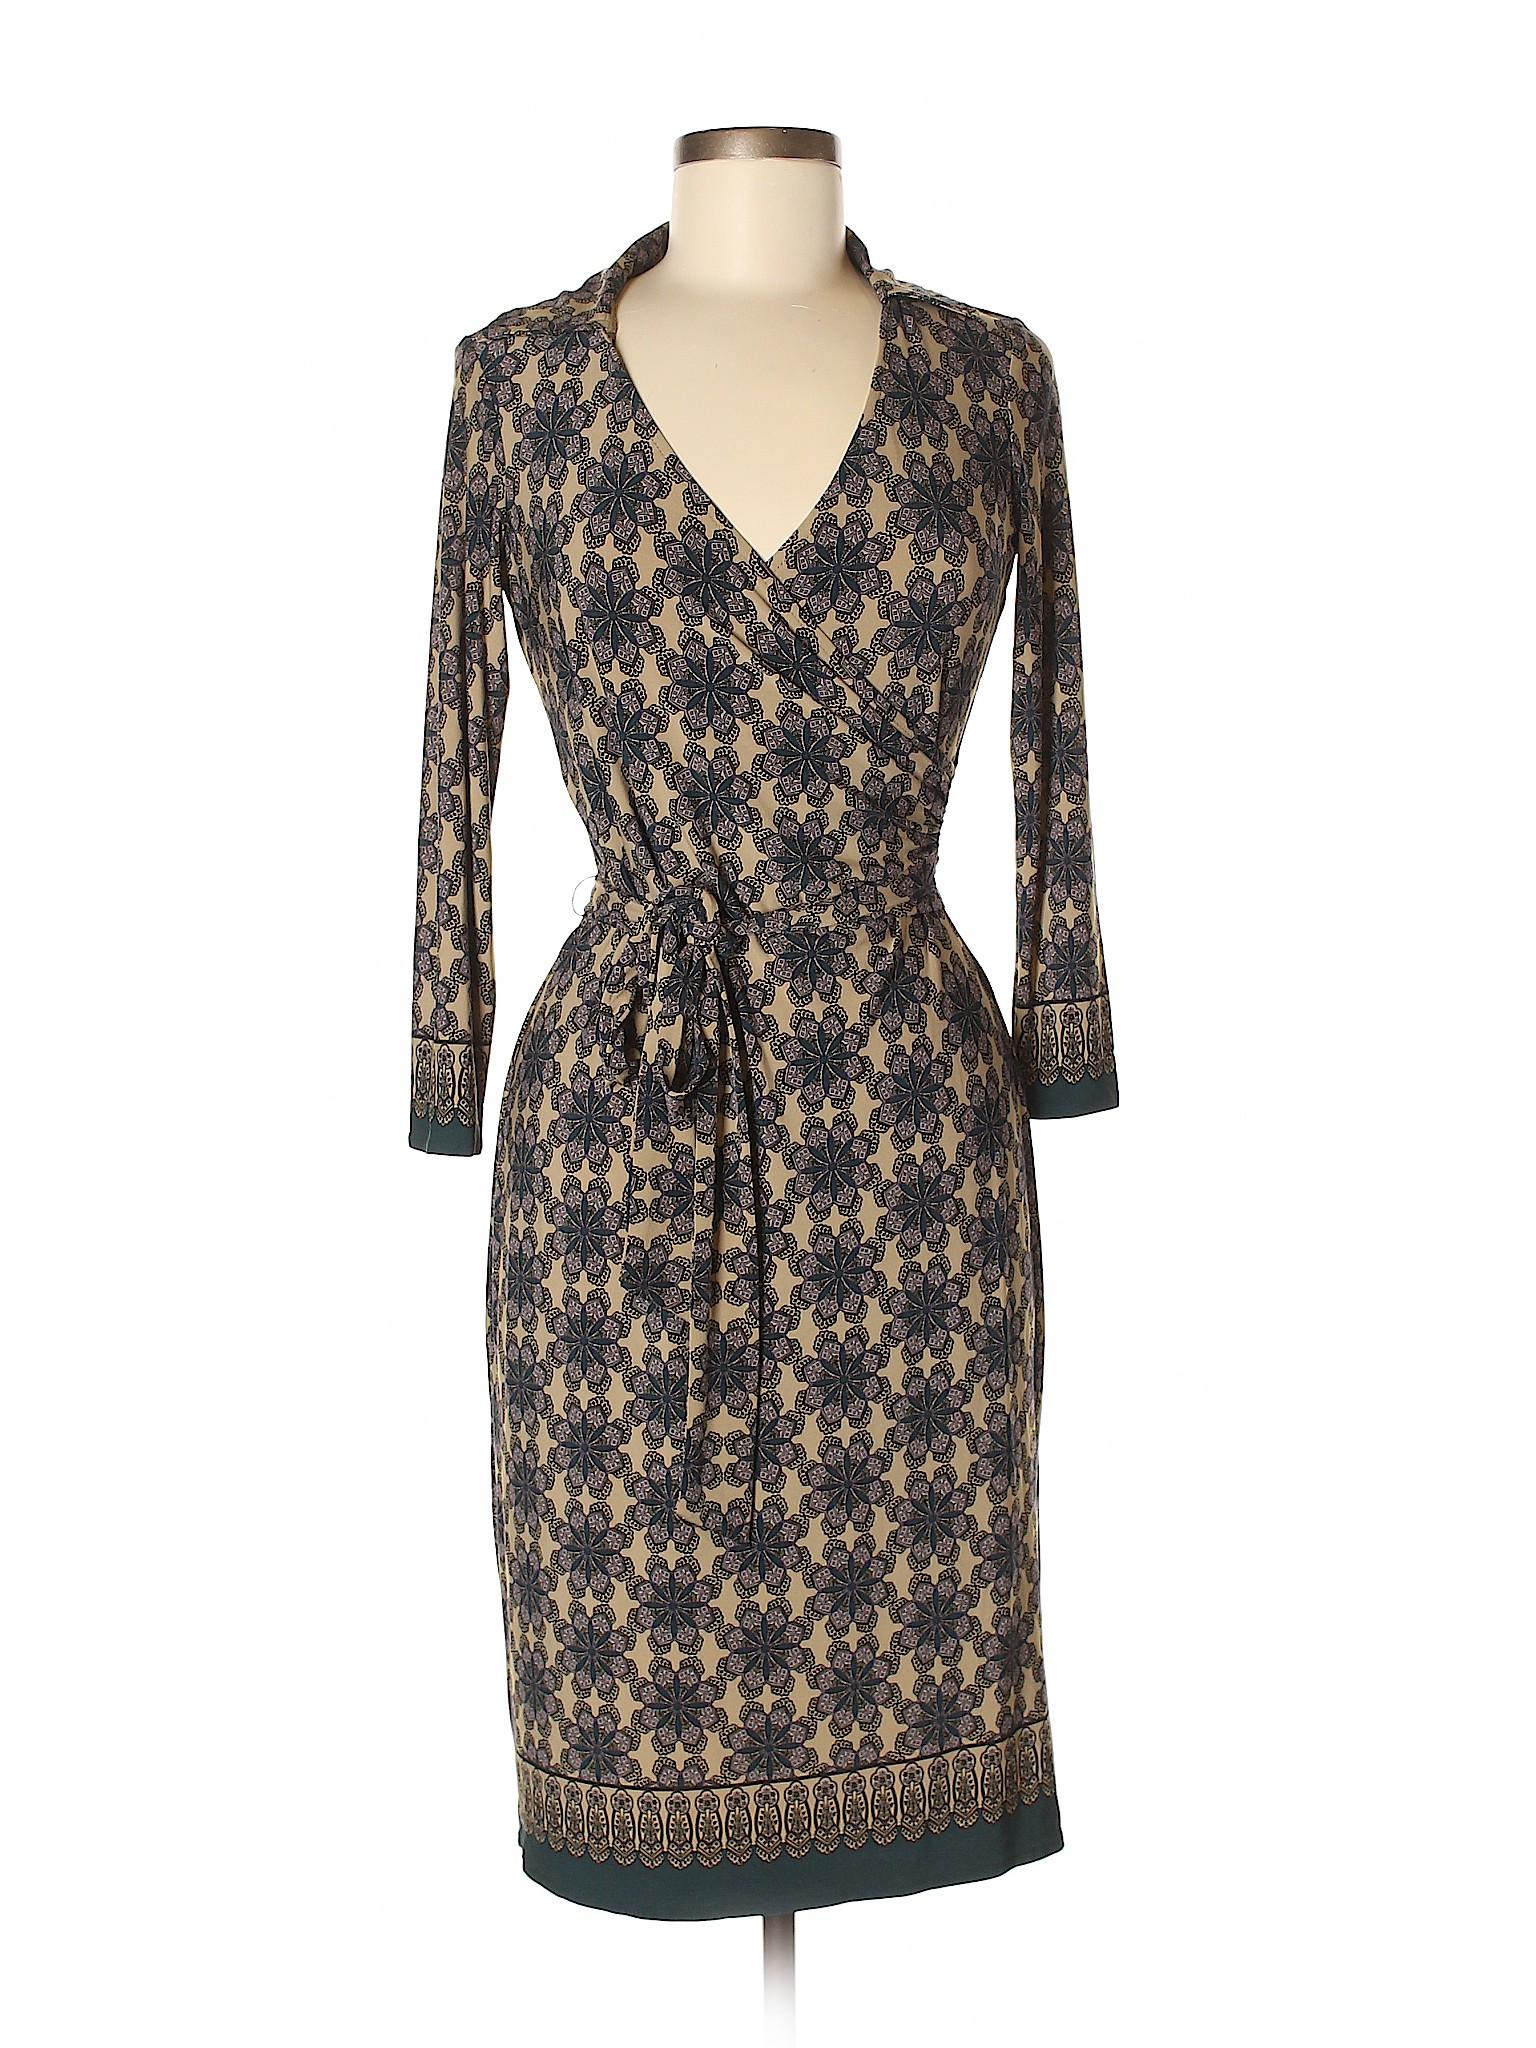 Casual winter Boutique London Dress Times Ot6xwHaq6